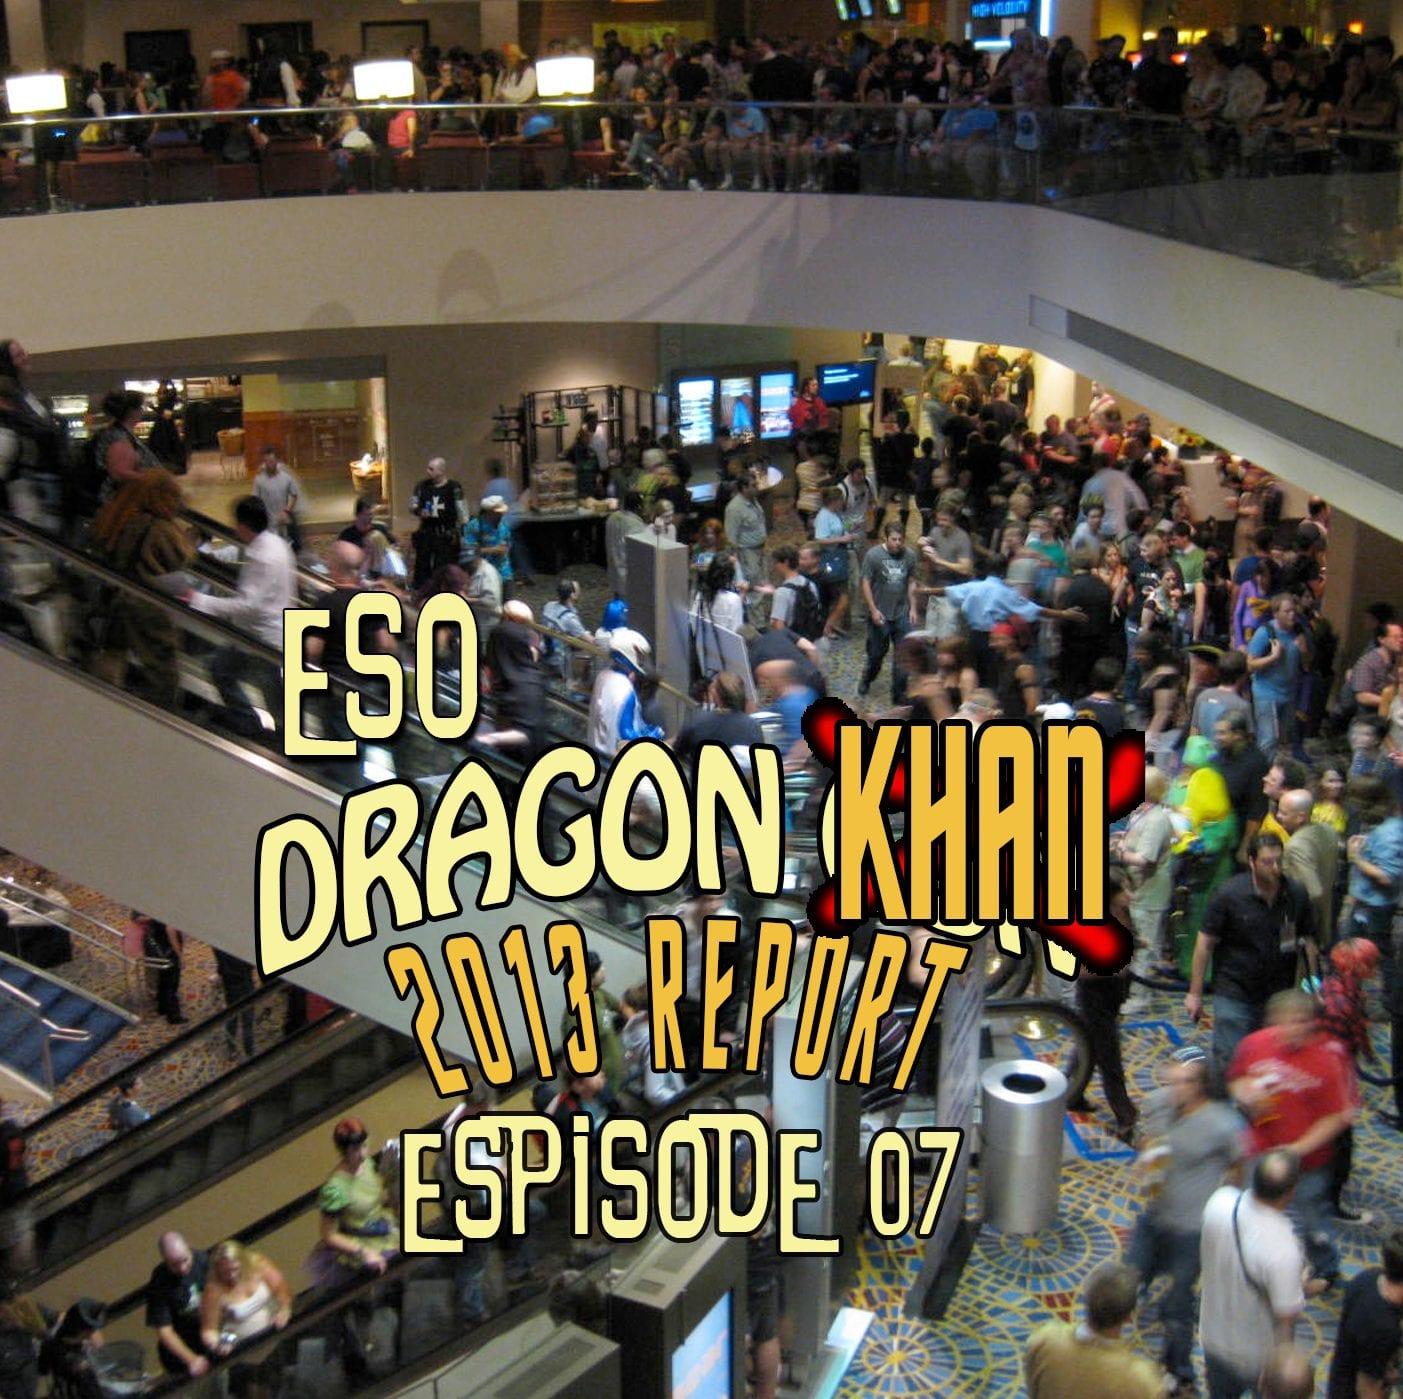 ESO Dragon Con 2013 Khan Report Ep 7